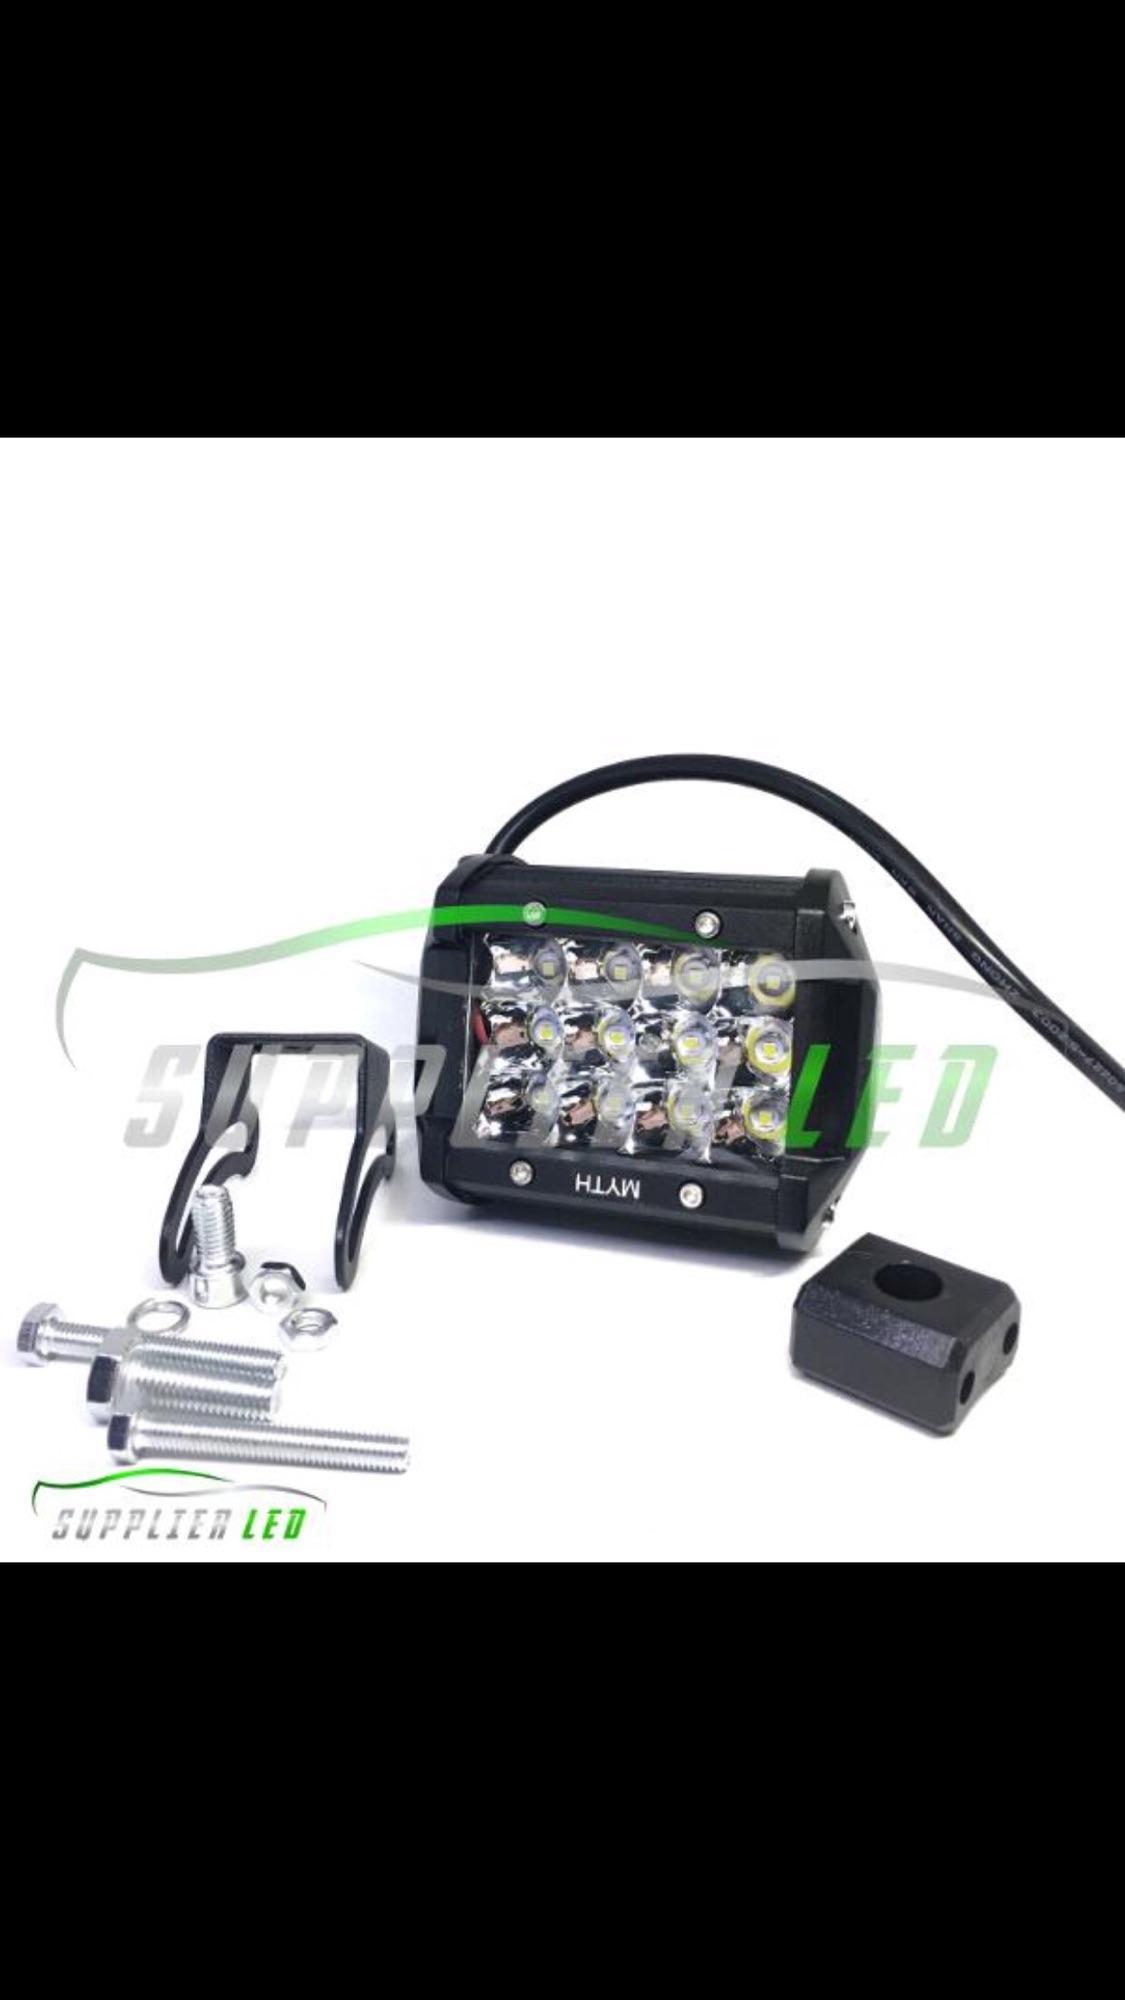 Cek Harga Baru Lampu Tembak Led 2 Mata Sorot Titik Cree U5 Transformer Light Motor Offroad 12 Tiga Susun Sangat Terang